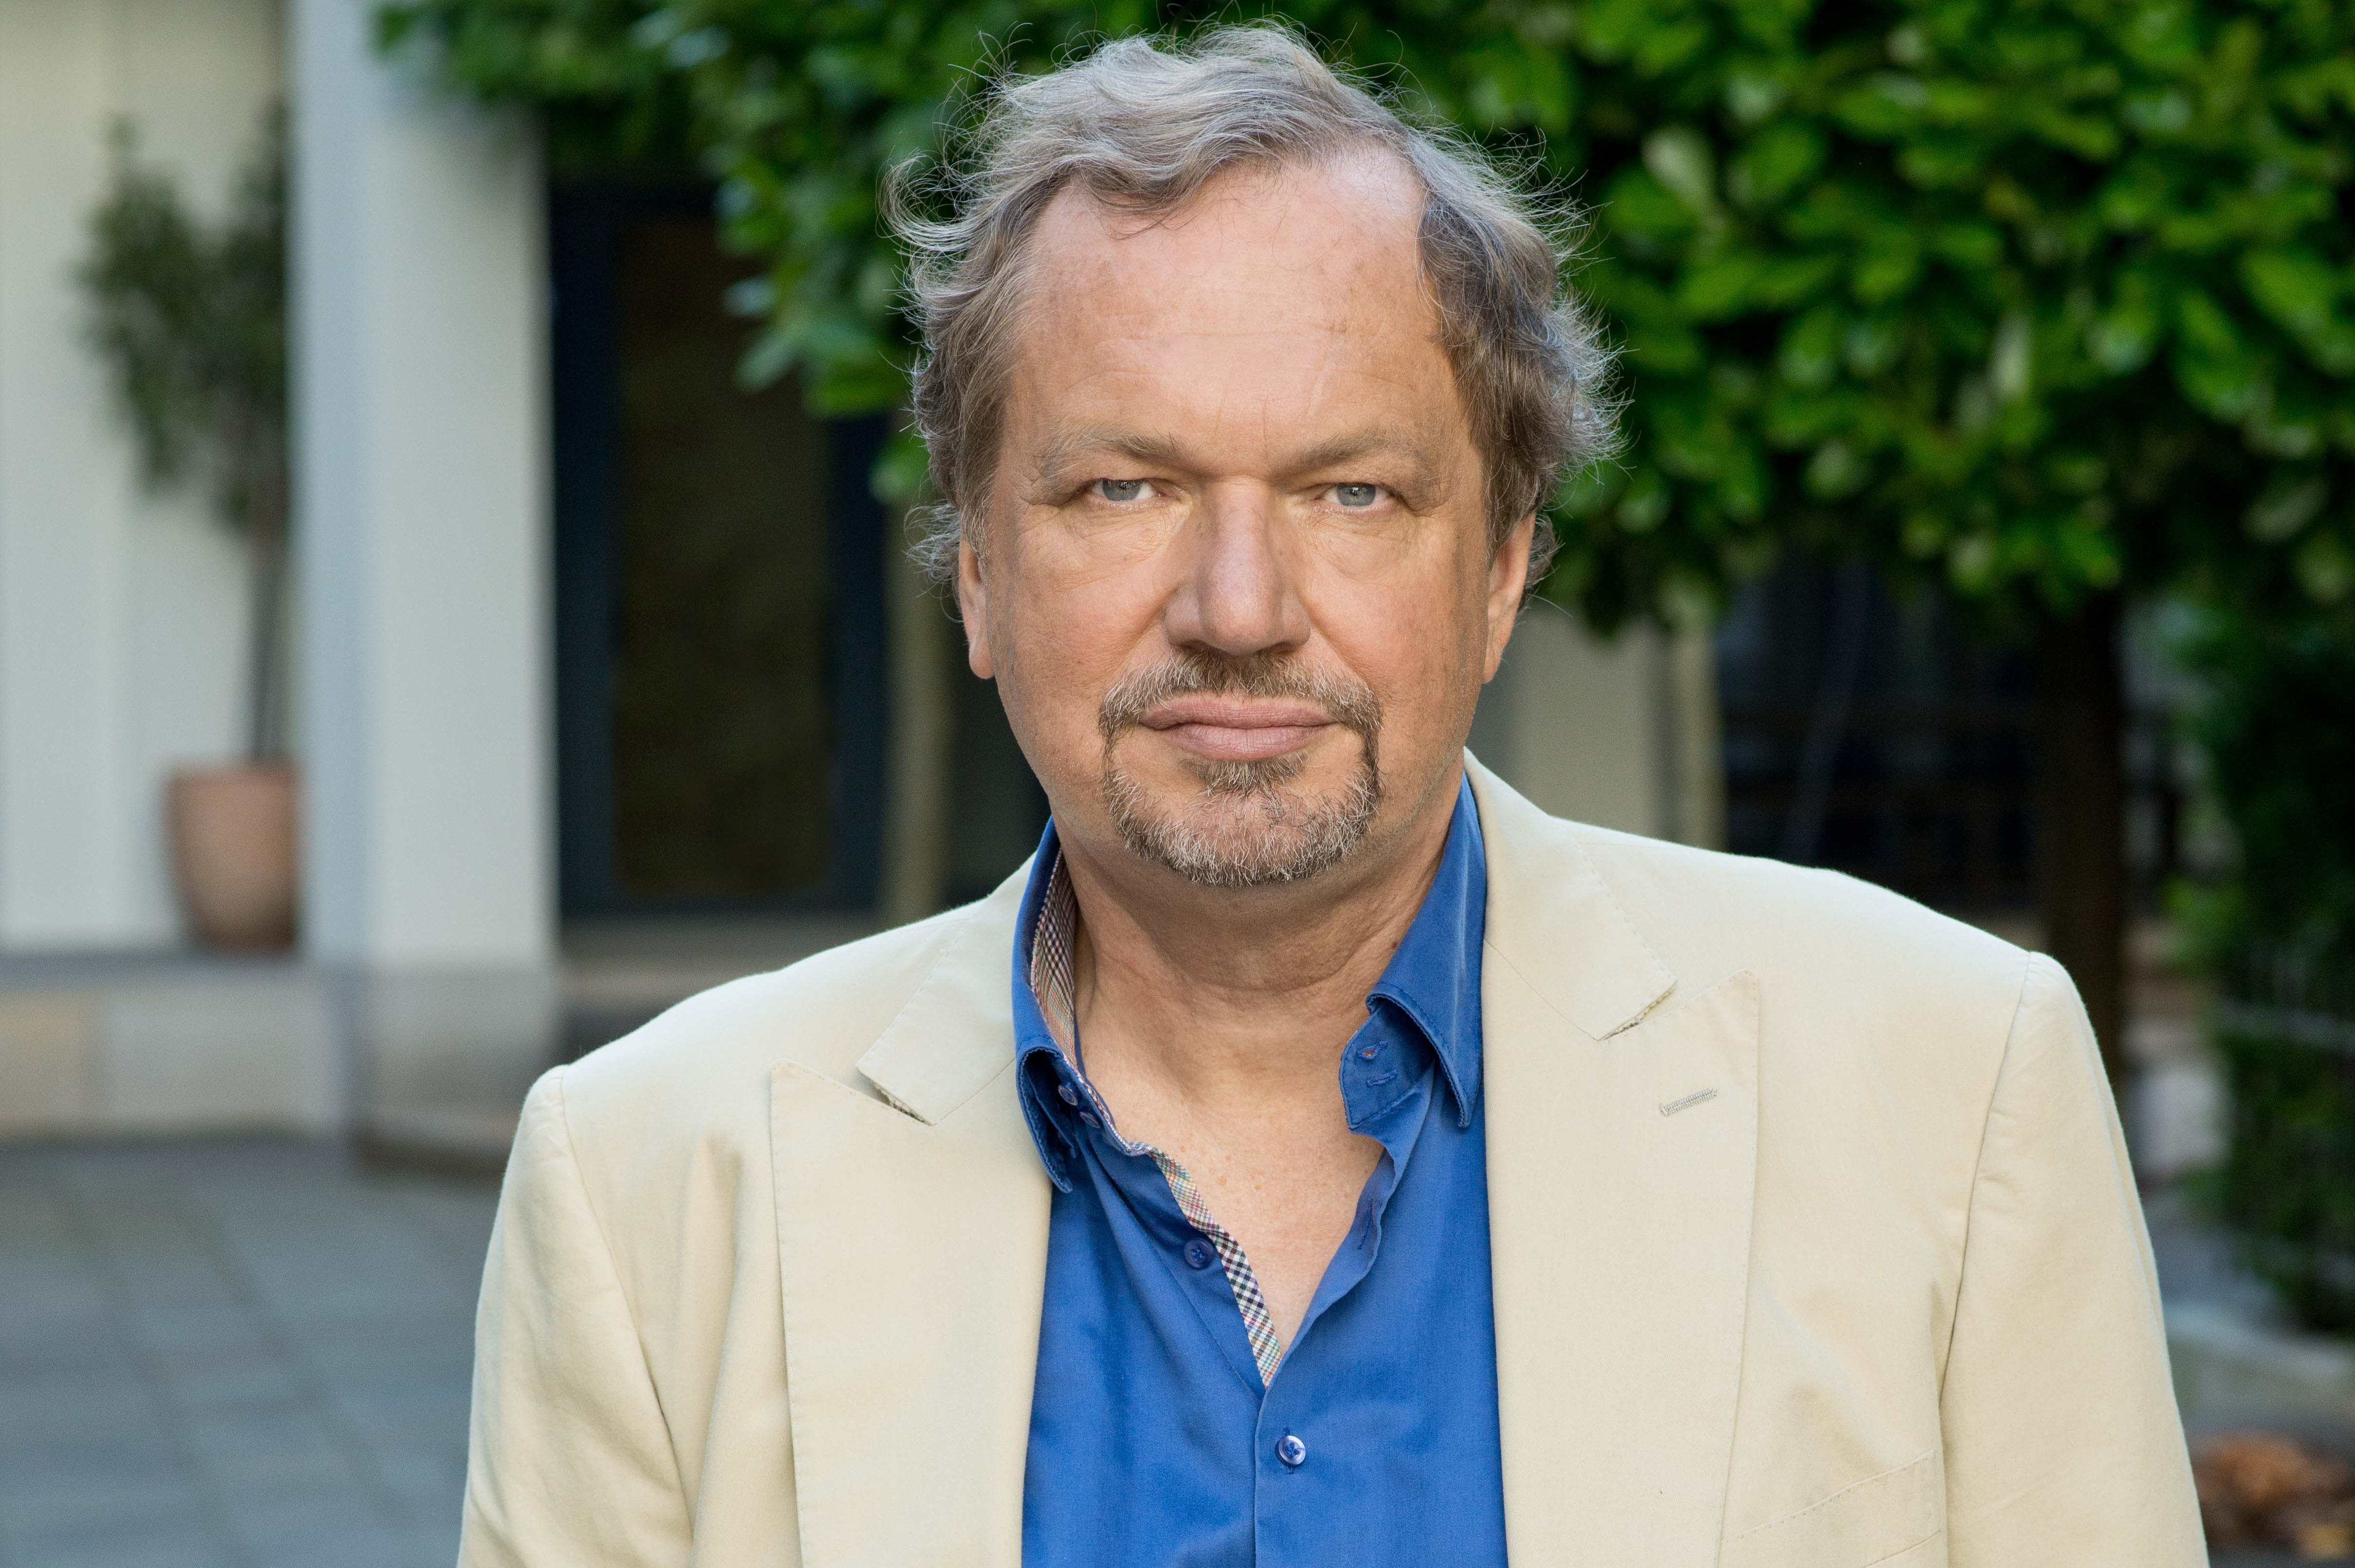 Prof. Jens Michow